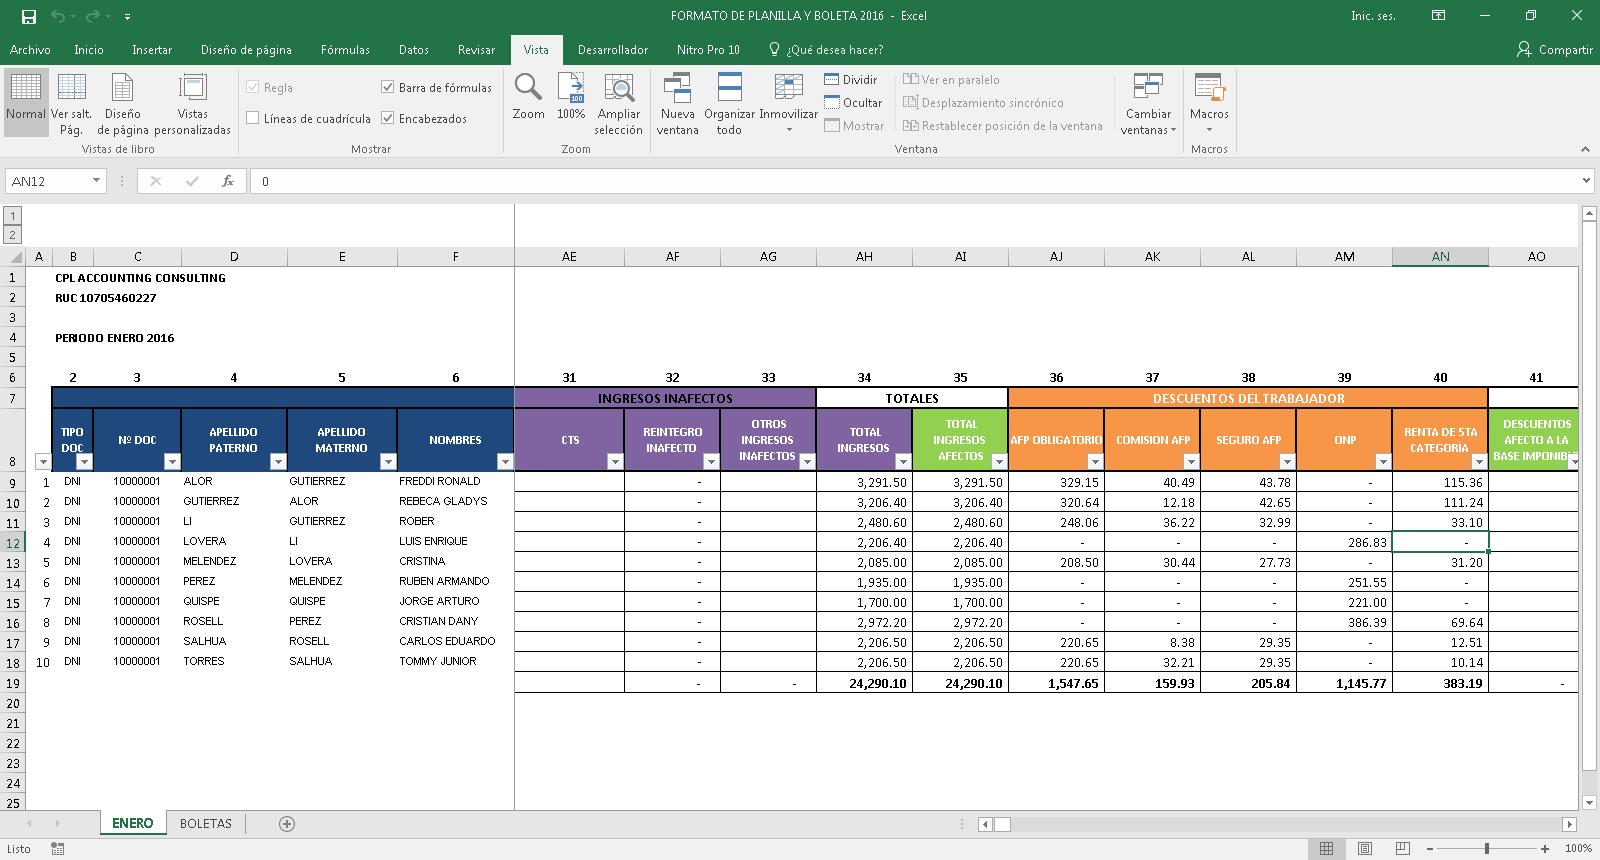 Cpl Accounting Consulting Planilla De Remuneraciones B Sica